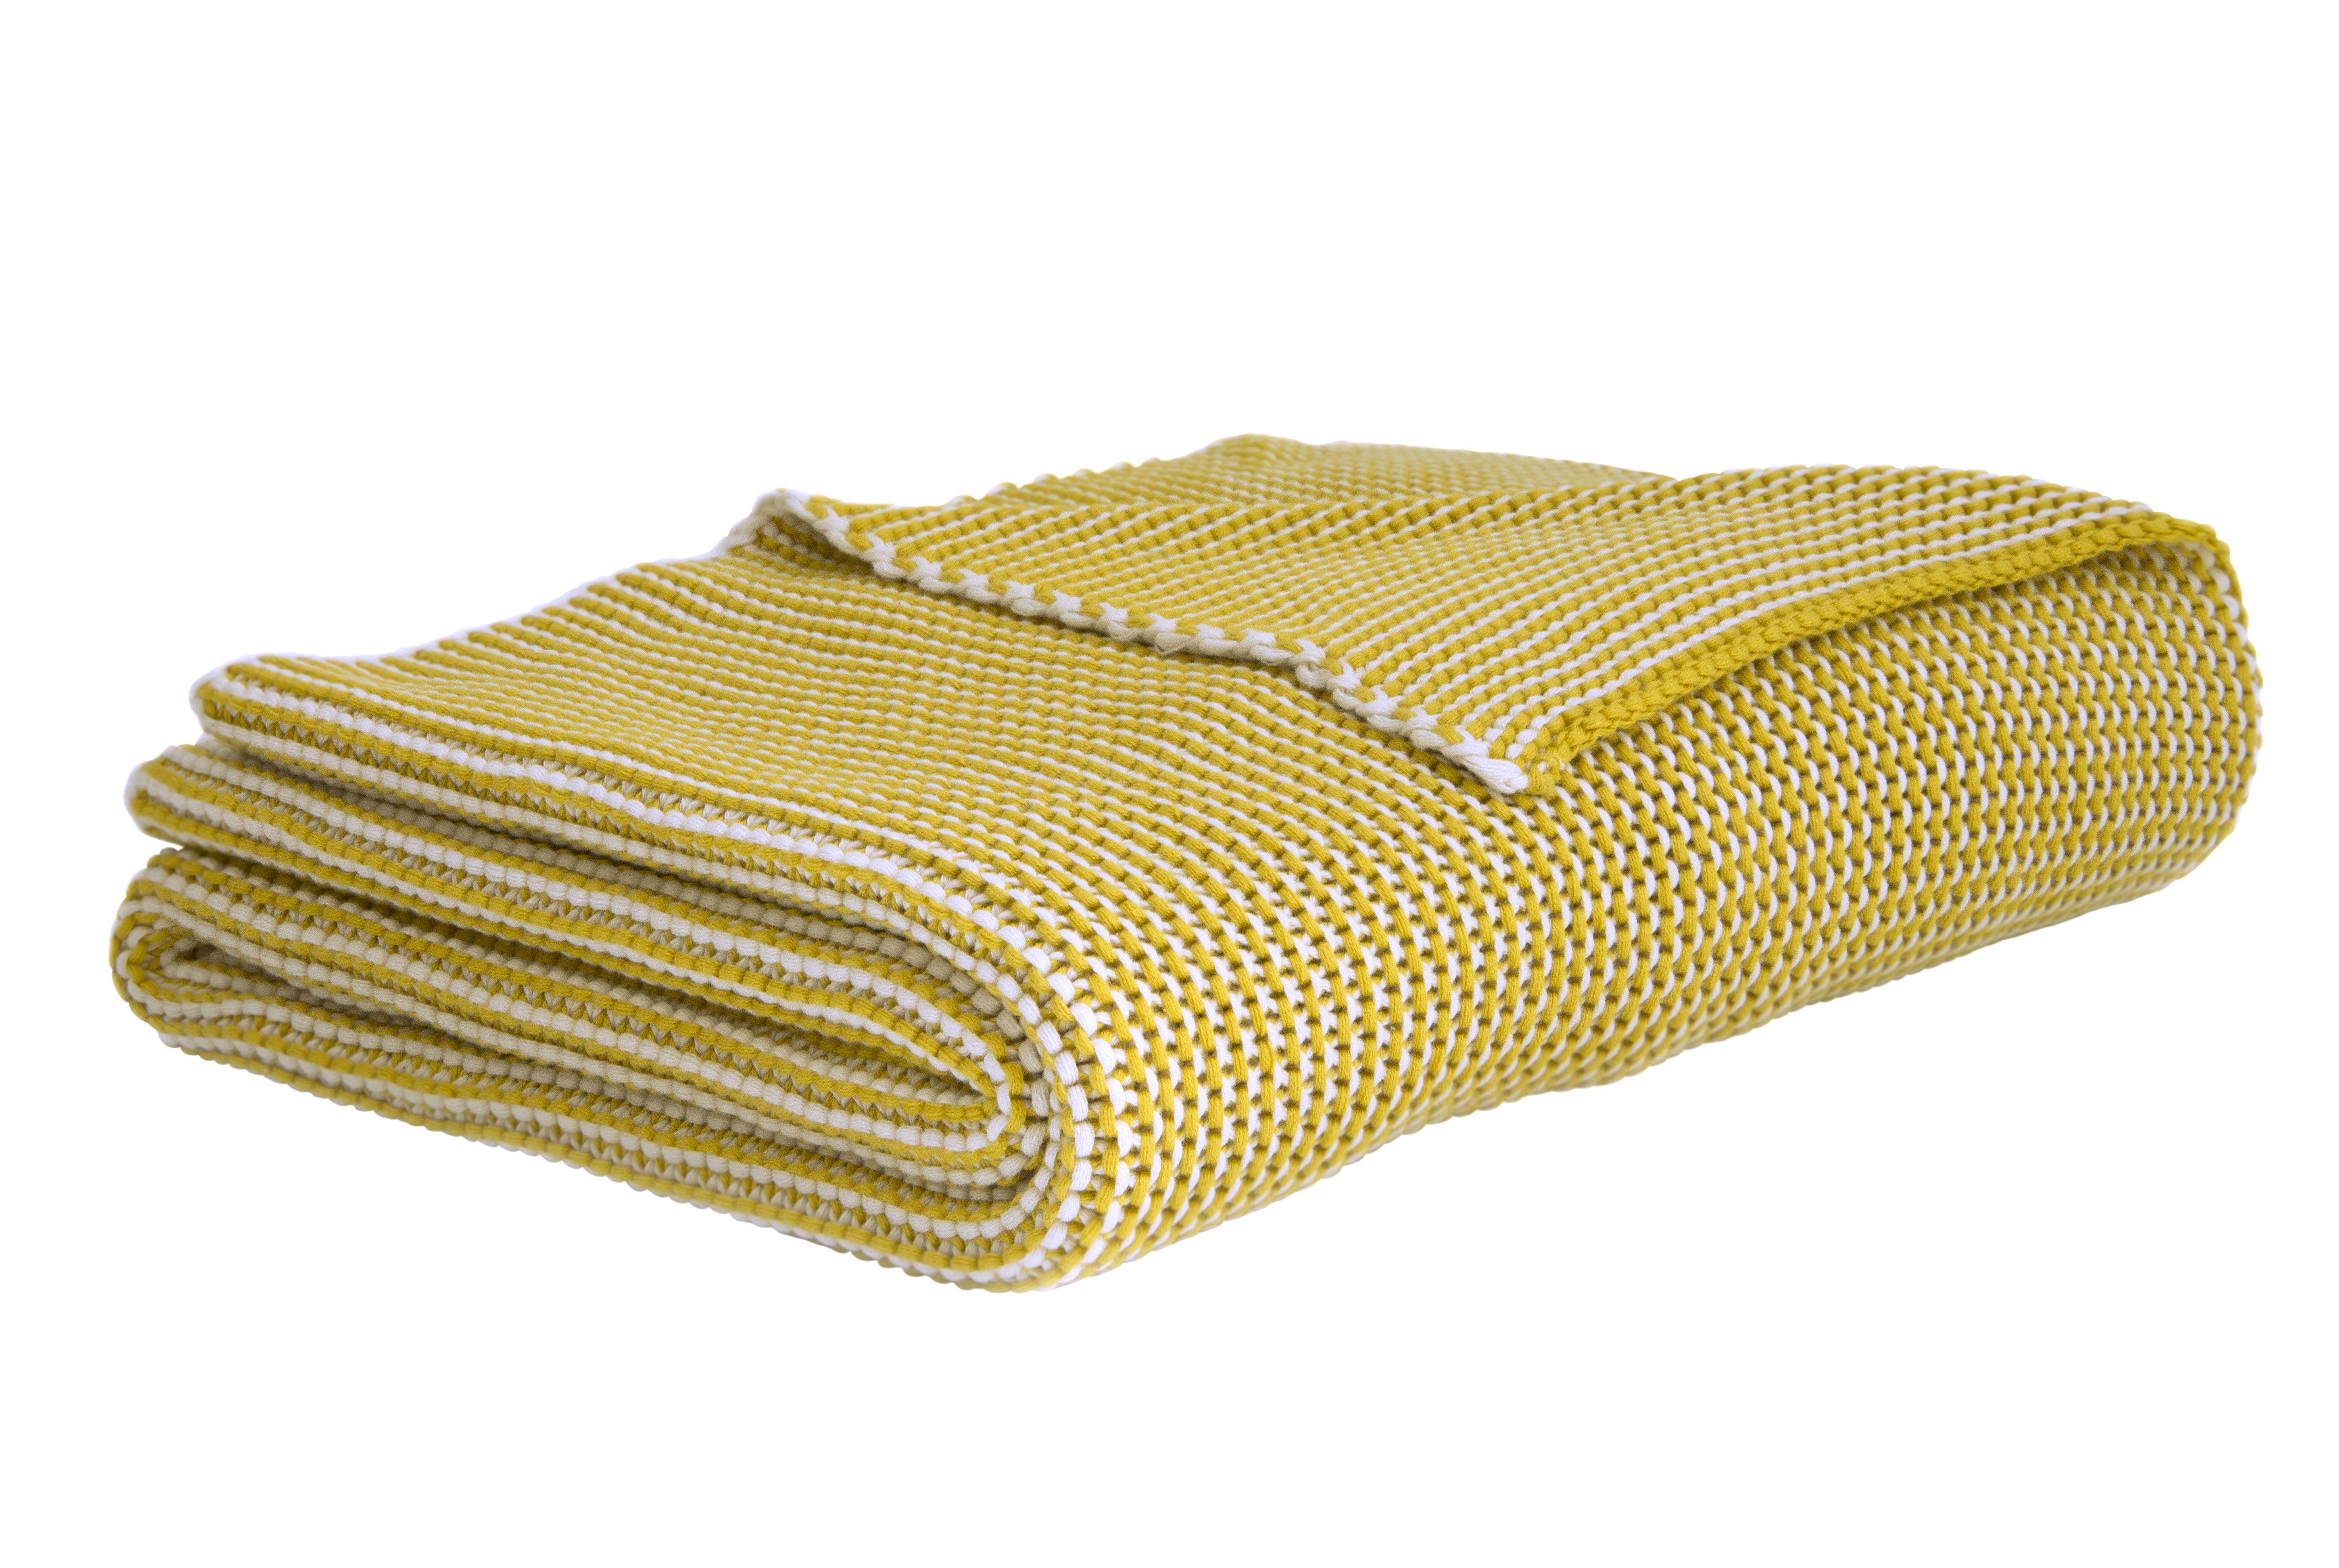 plaid roccamare 130 x 170 cm jaune moutarde enostudio. Black Bedroom Furniture Sets. Home Design Ideas